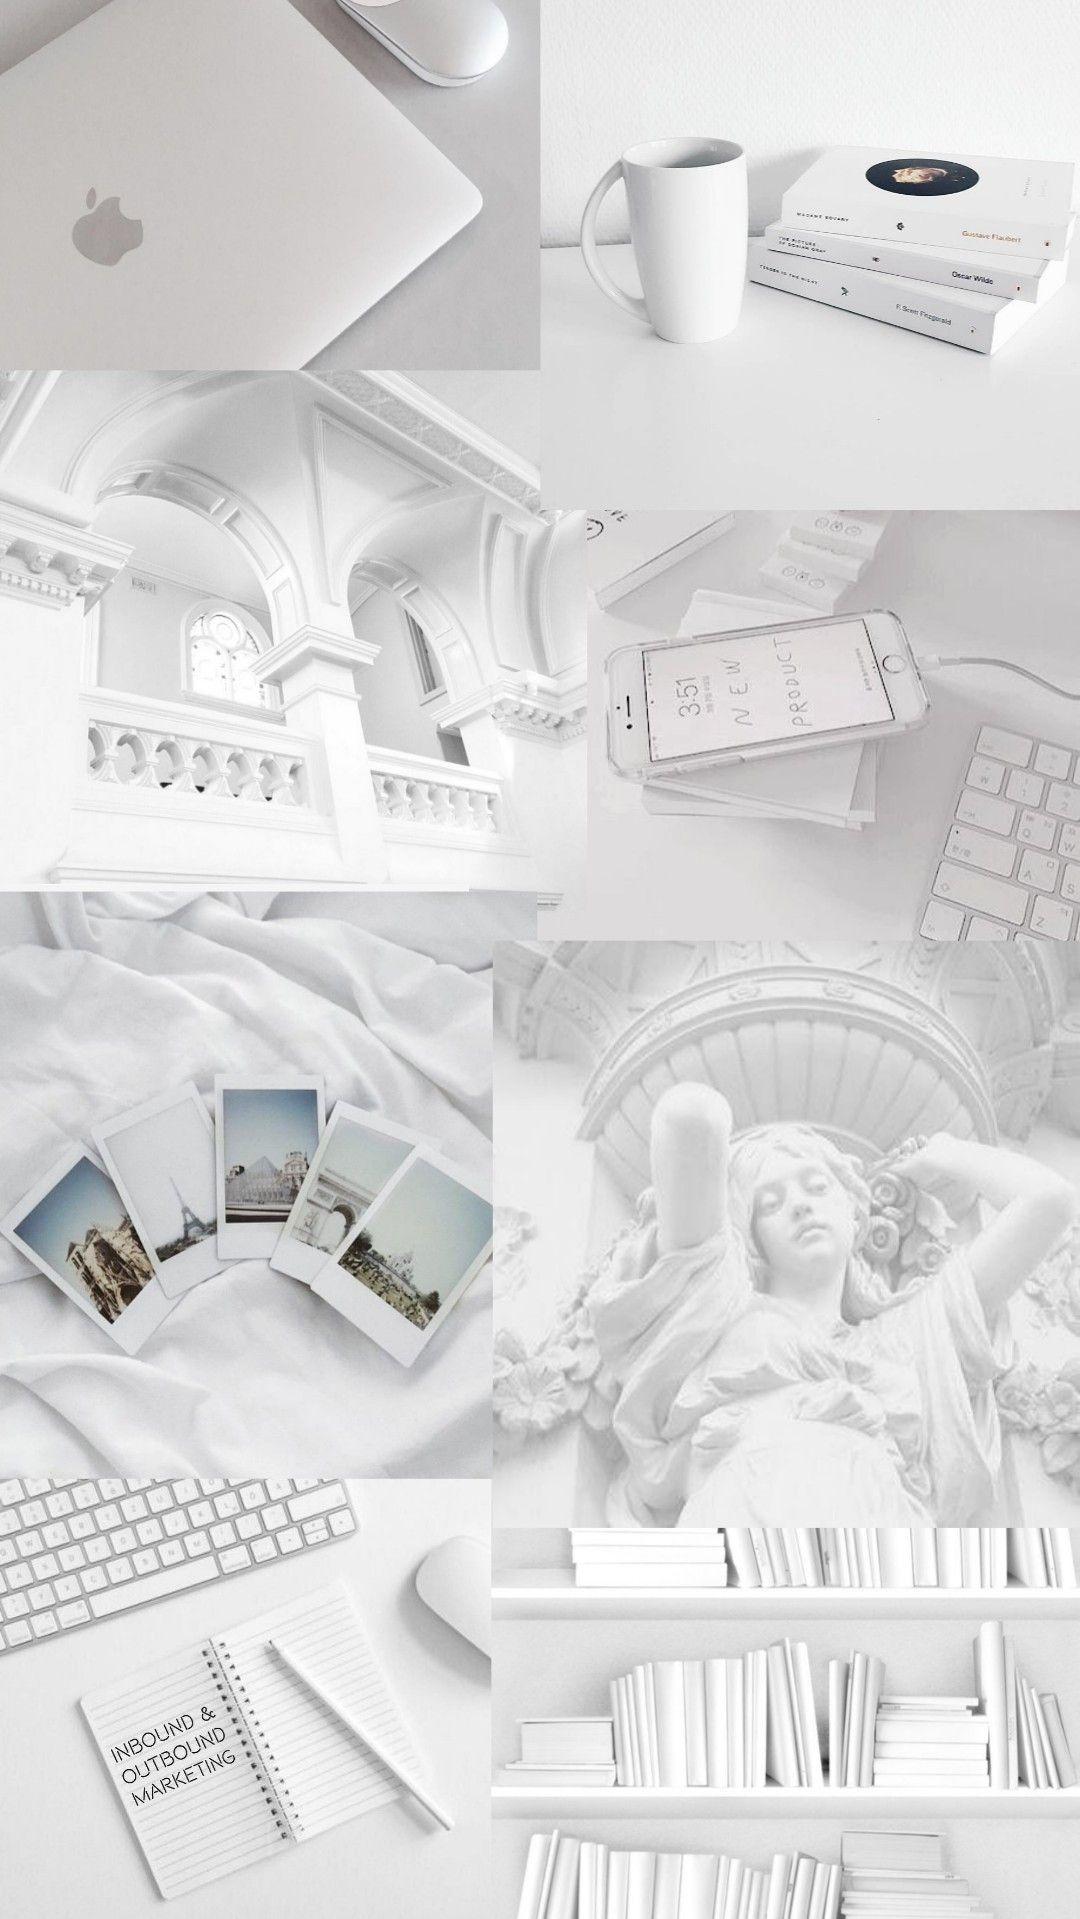 Wallpaper Aesthetic Kertas Dinding Wallpaper Ponsel Dinding Gambar